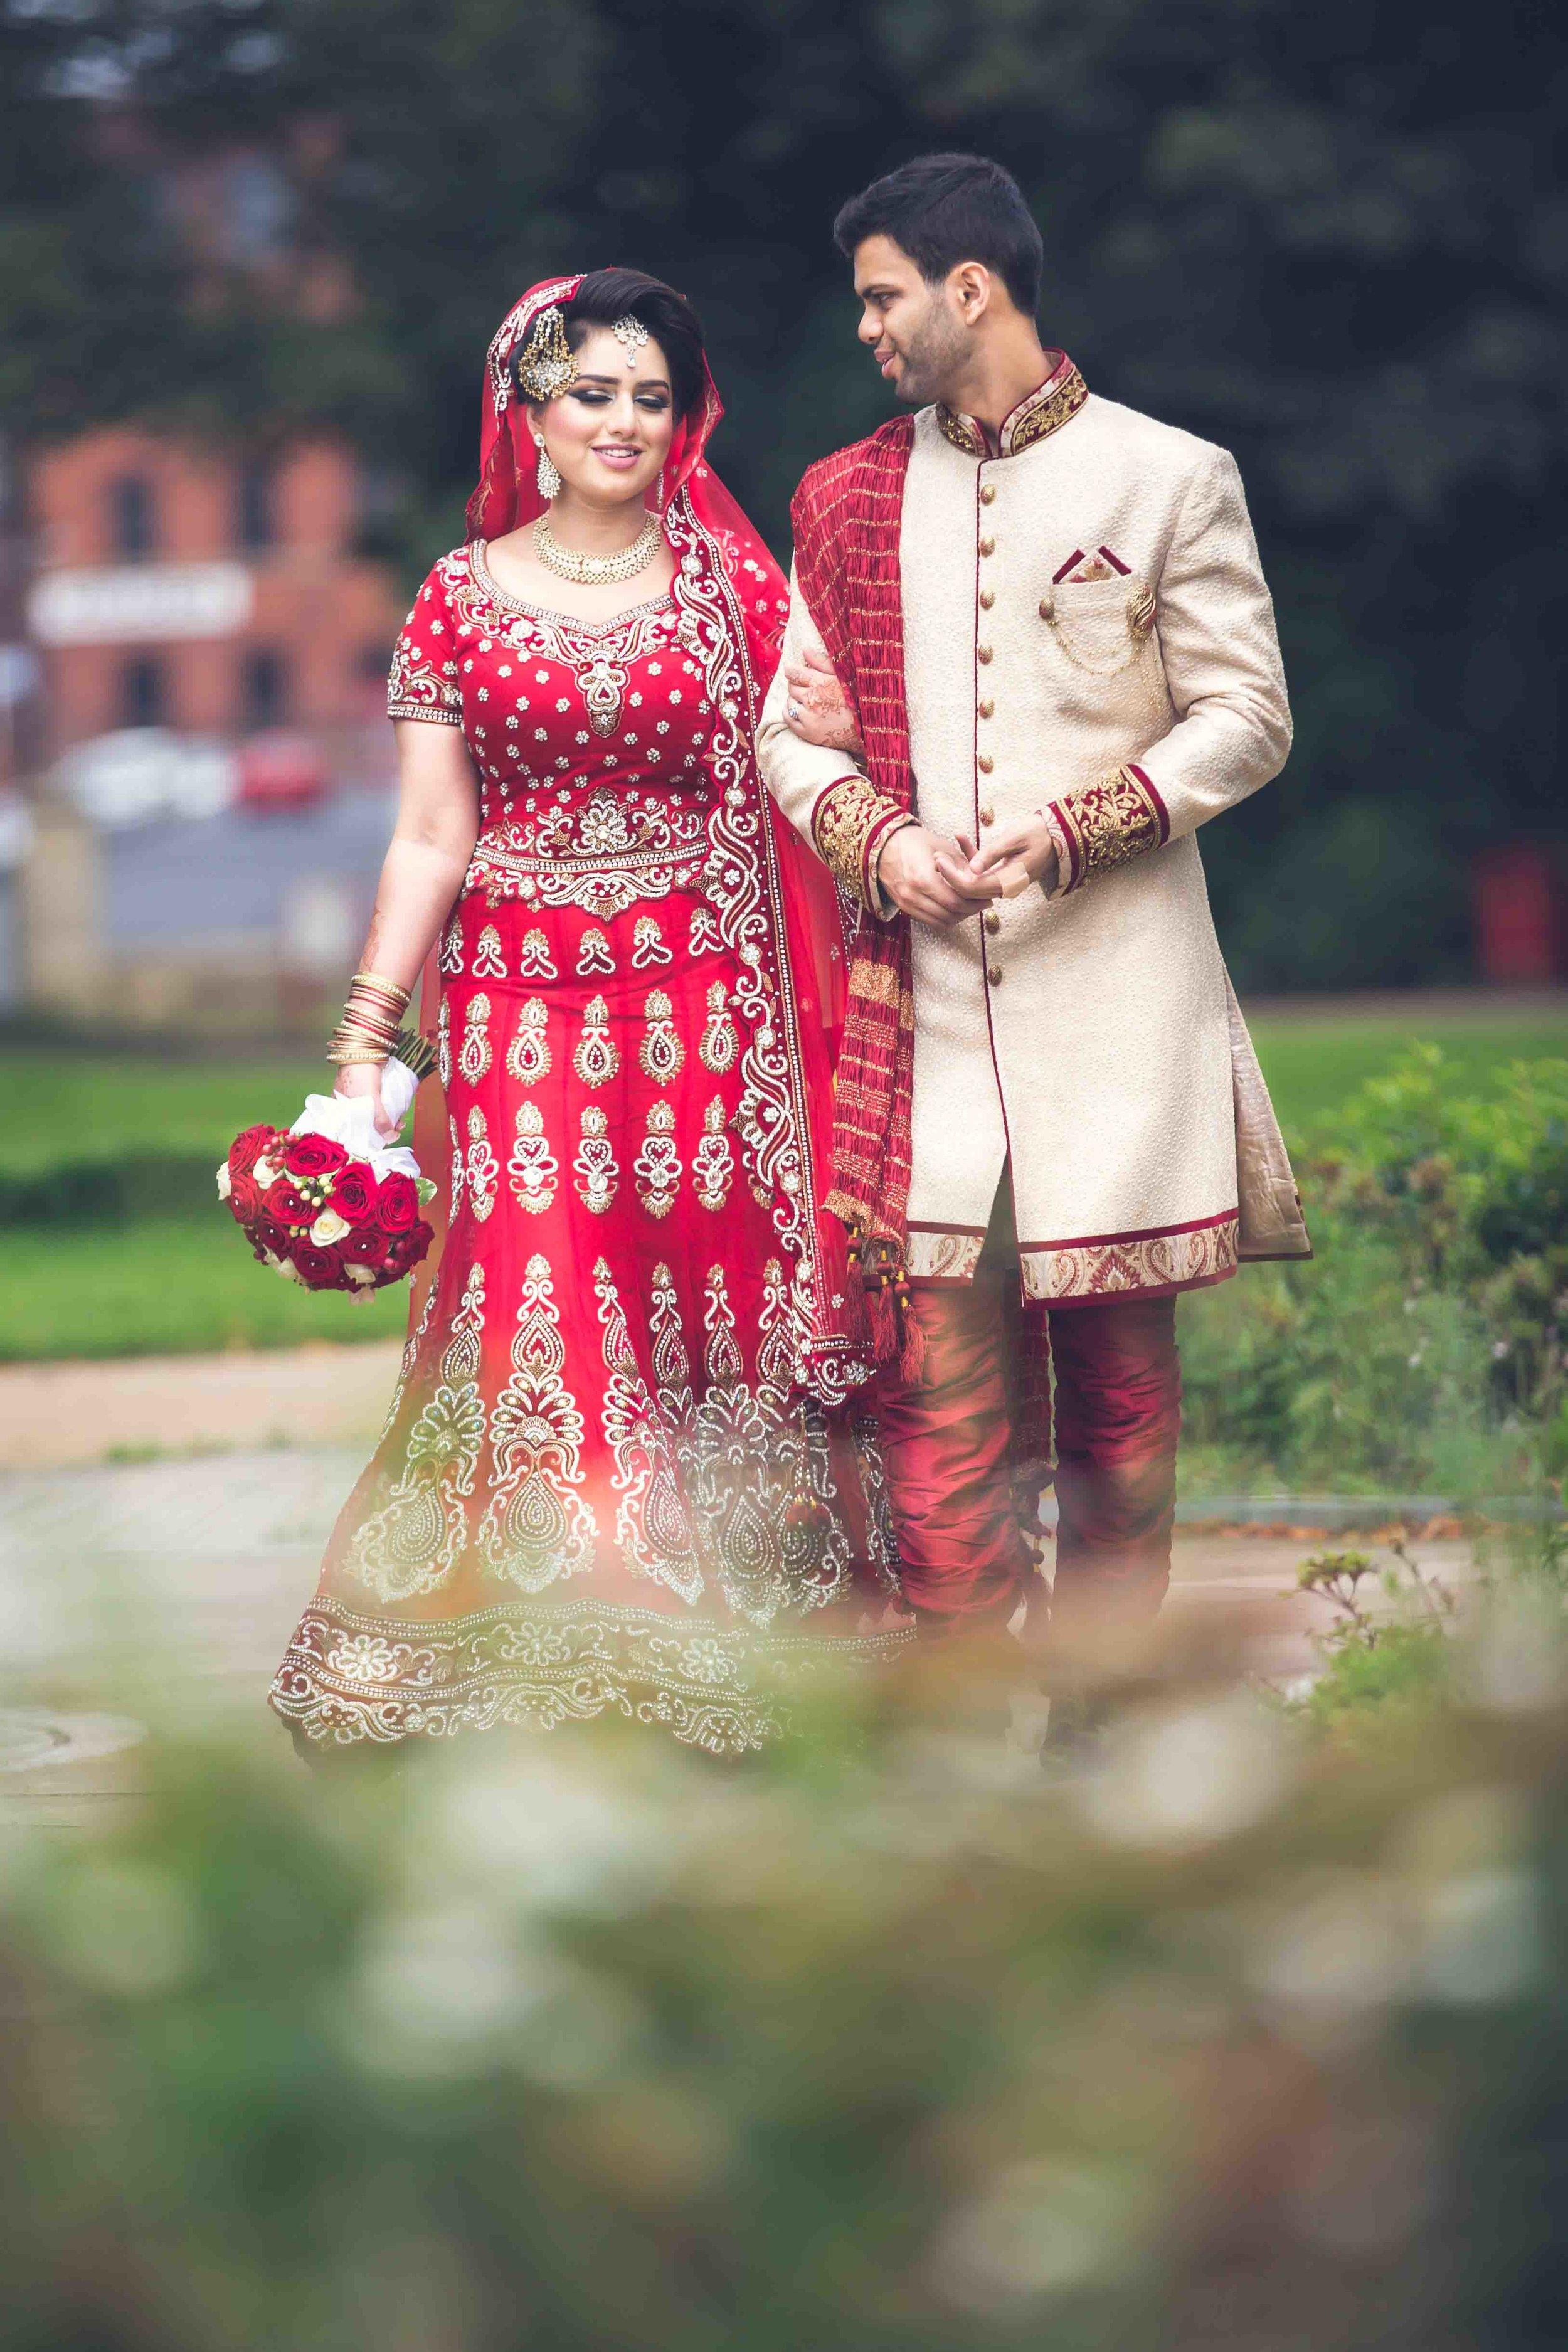 Asian Wedding Photographer Opu Sultan Photography Lyme Park Scotland Edinburgh Glasgow London Manchester Liverpool Birmingham Wedding Photos prewed shoot Jams & Tams Blod-27.jpg